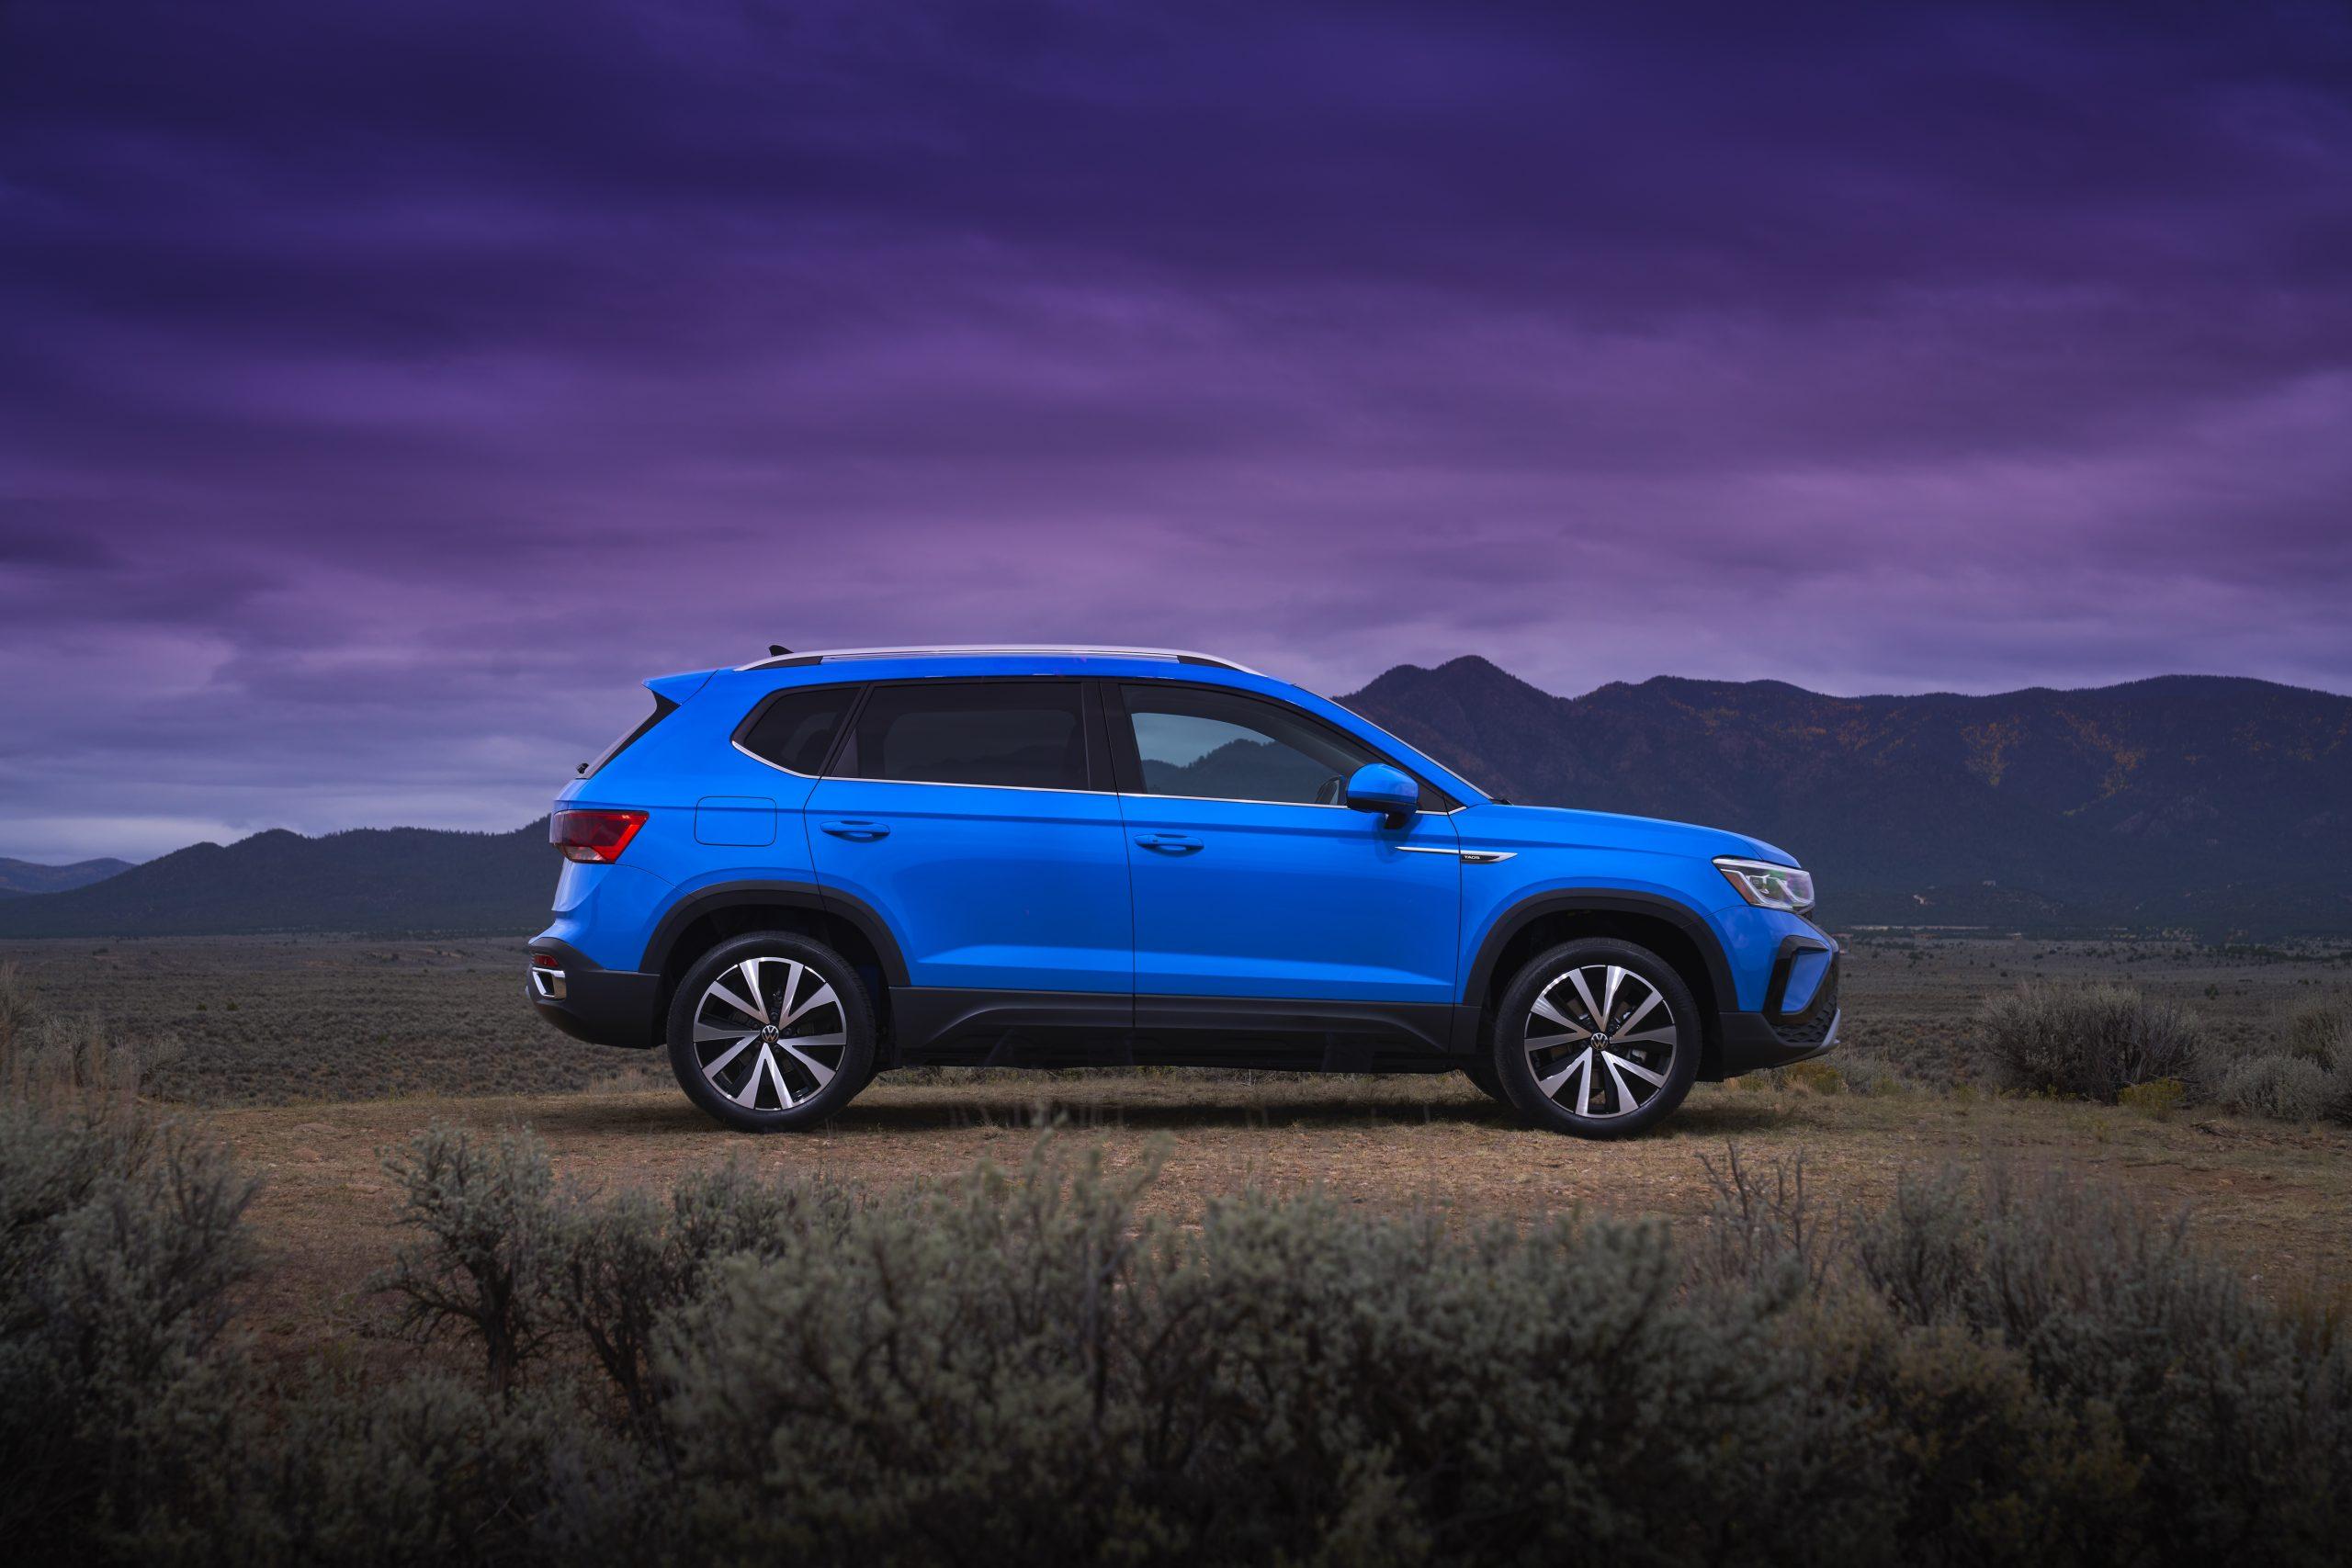 2022 Volkswagen Taos static side profile